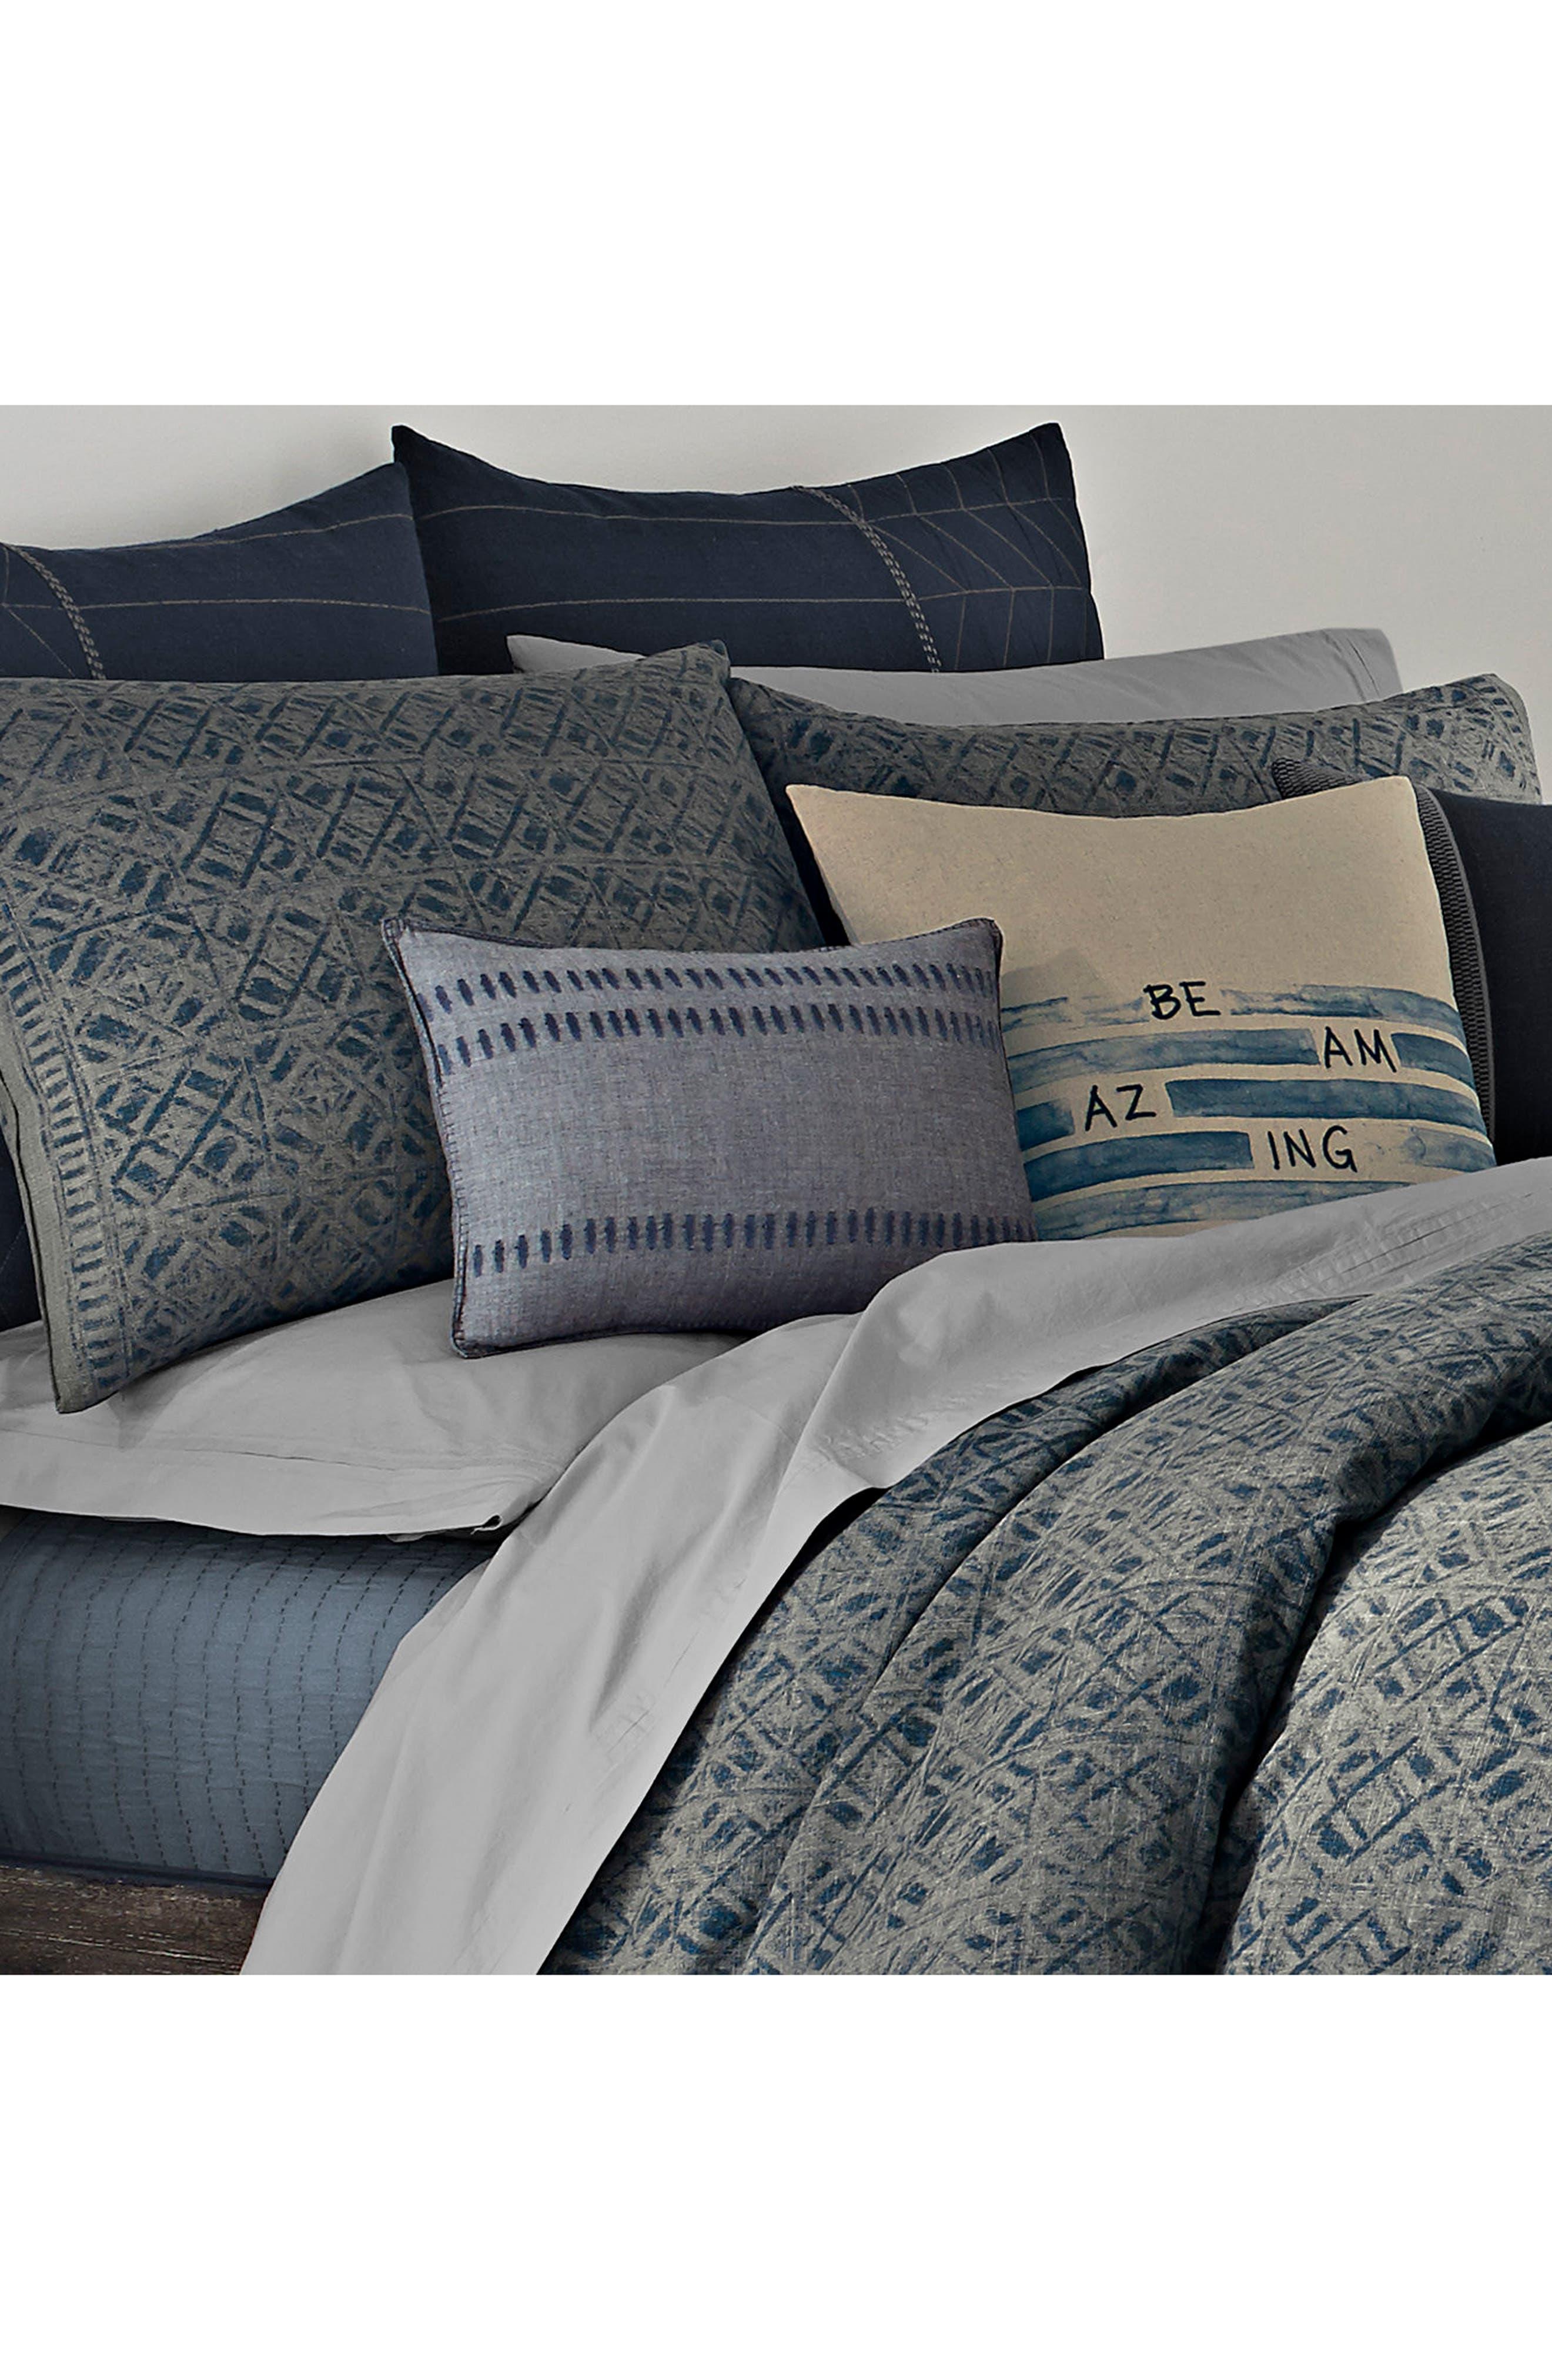 ED ELLEN DEGENERES, Nomad Stitched Accent Pillow, Alternate thumbnail 2, color, DARK GREY